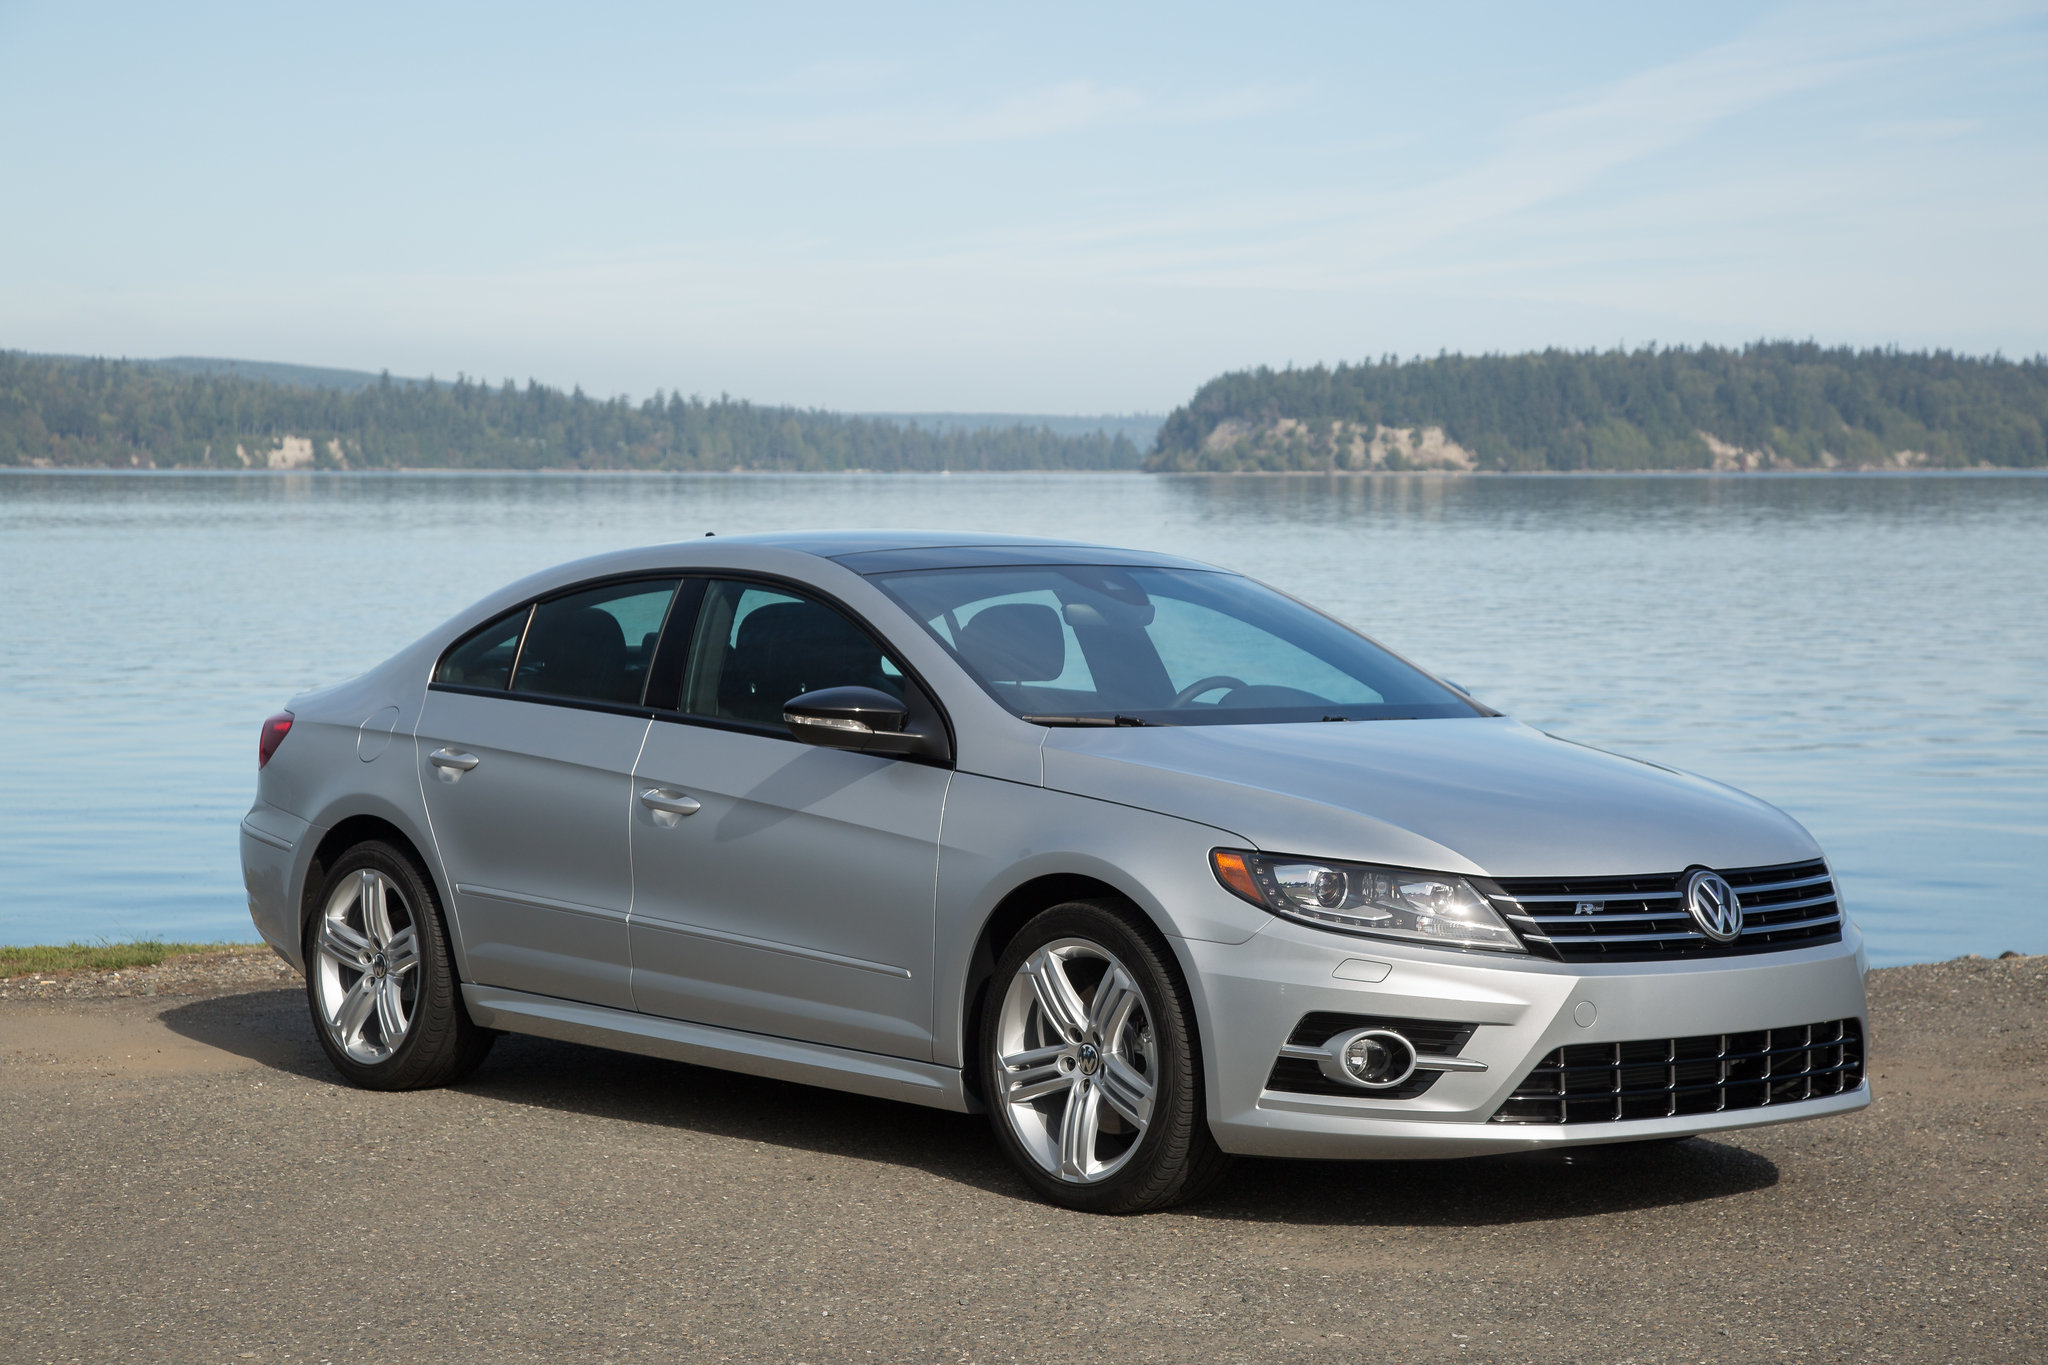 Volkswagen Recalls Sedans Wagons Due To Risk Of Engines